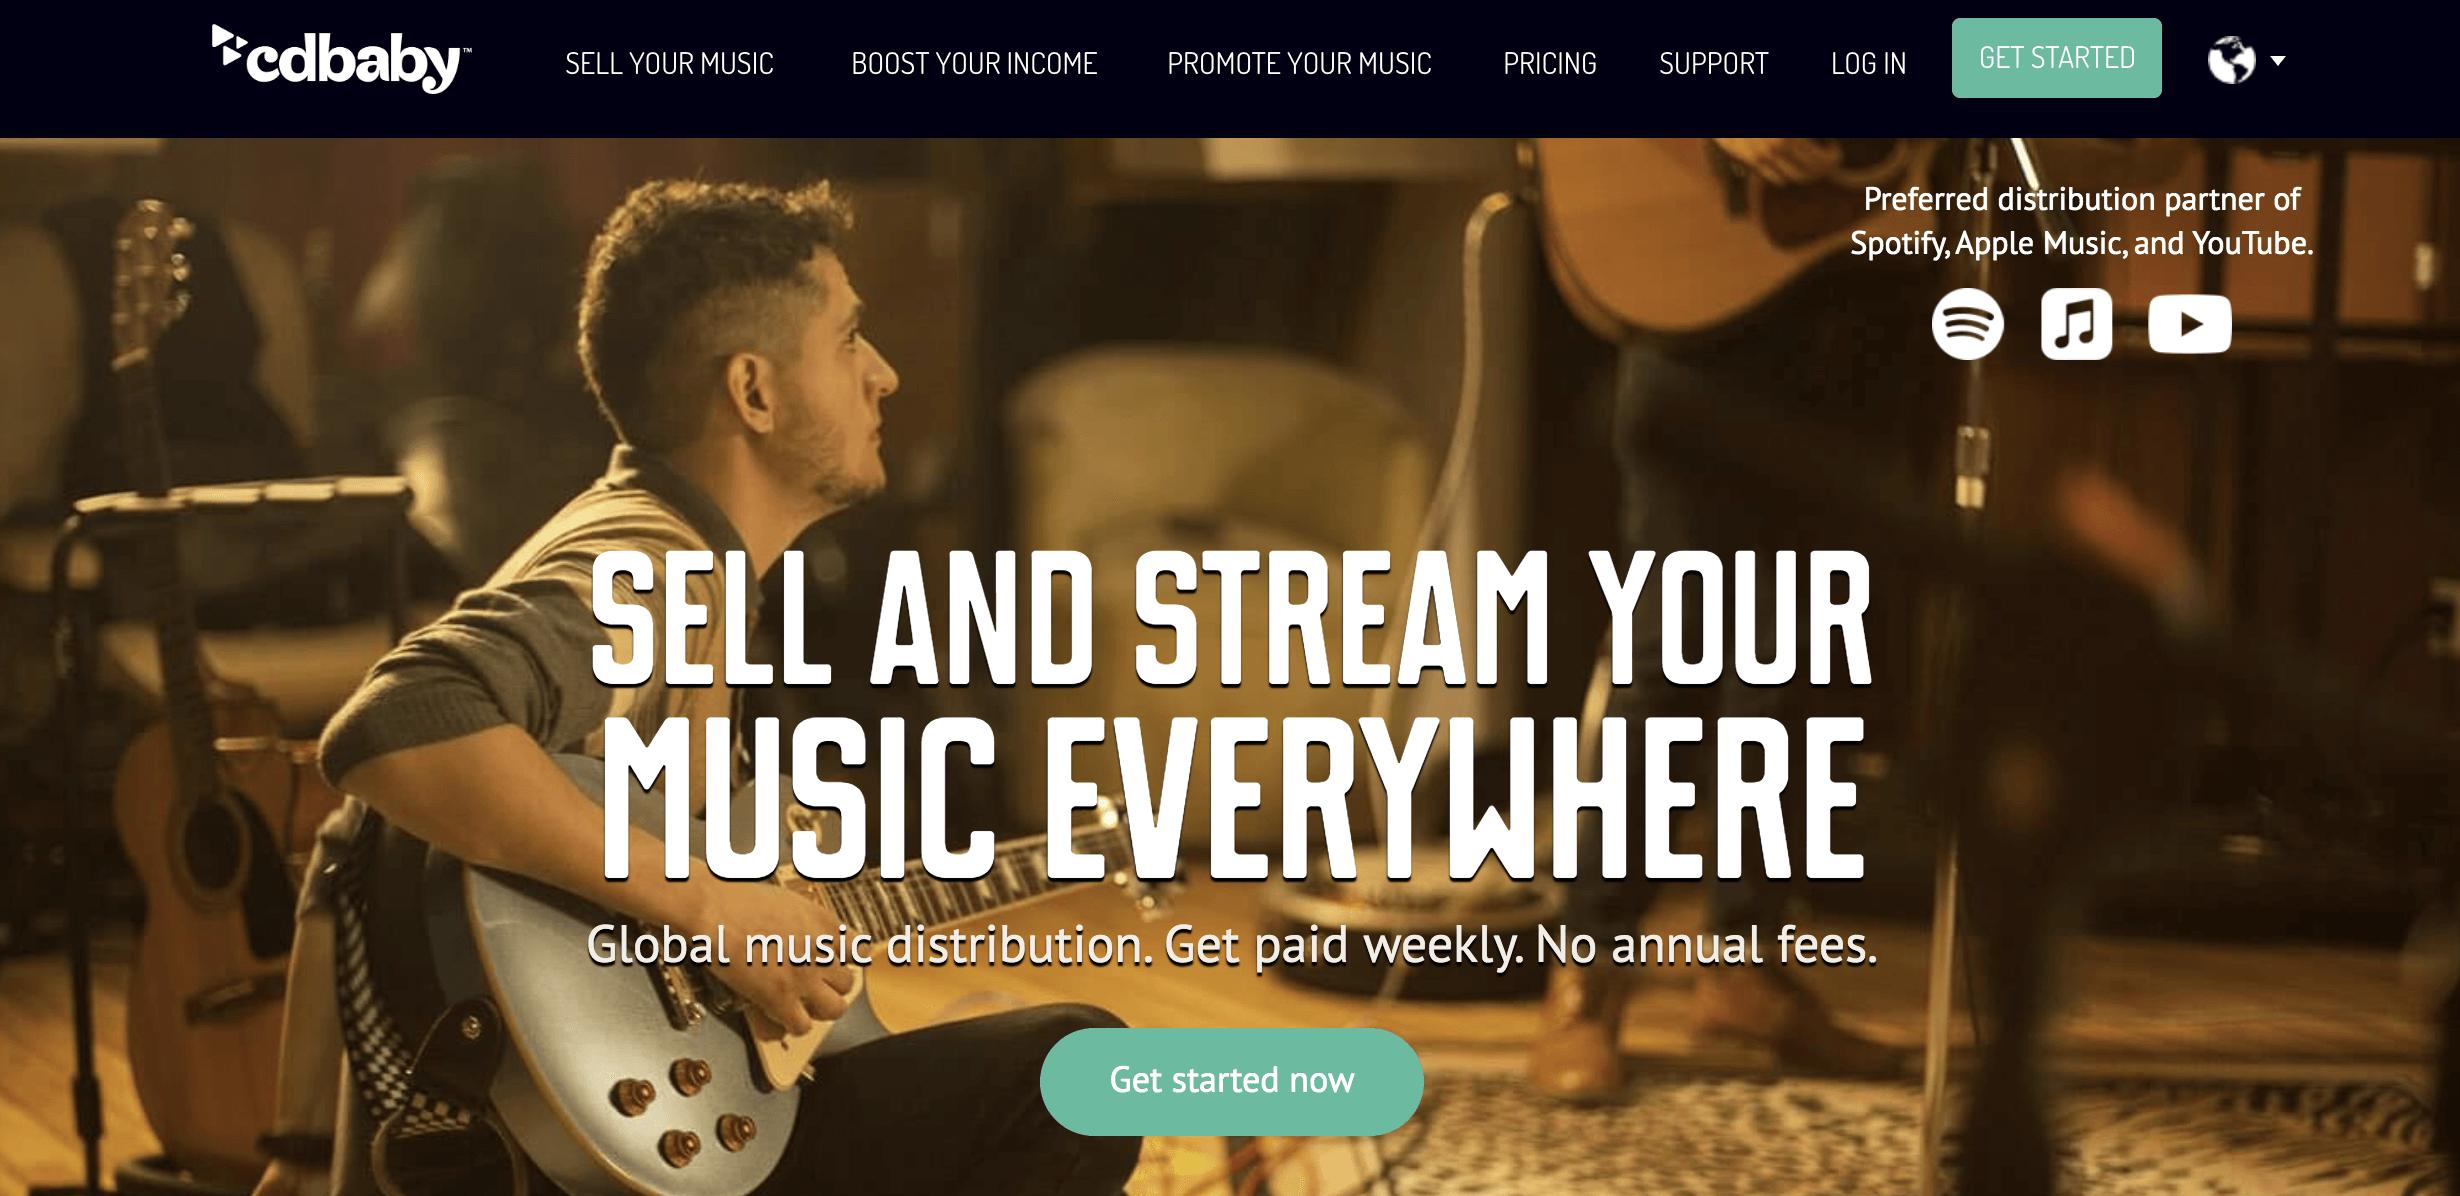 sell-music-online-cdbaby